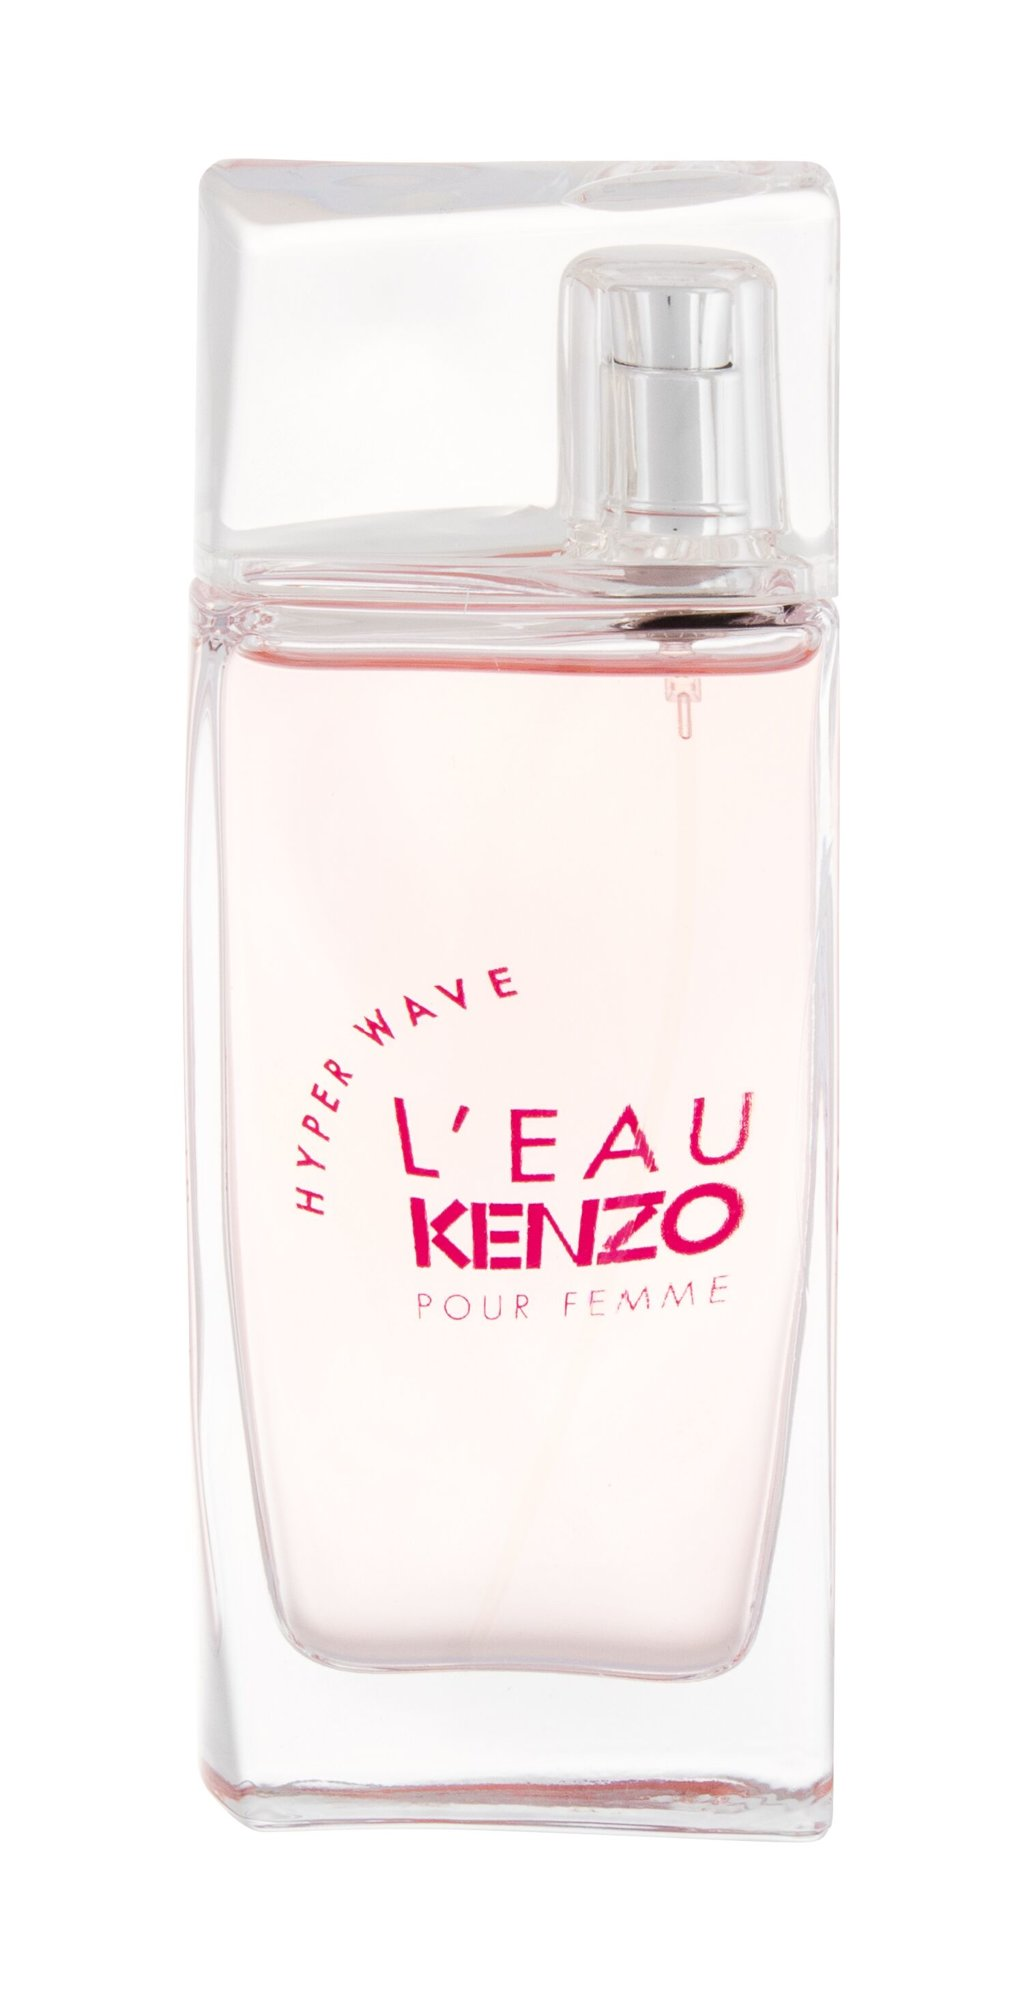 KENZO L´Eau Kenzo Pour Femme Hyper Wave, Toaletná voda 50ml